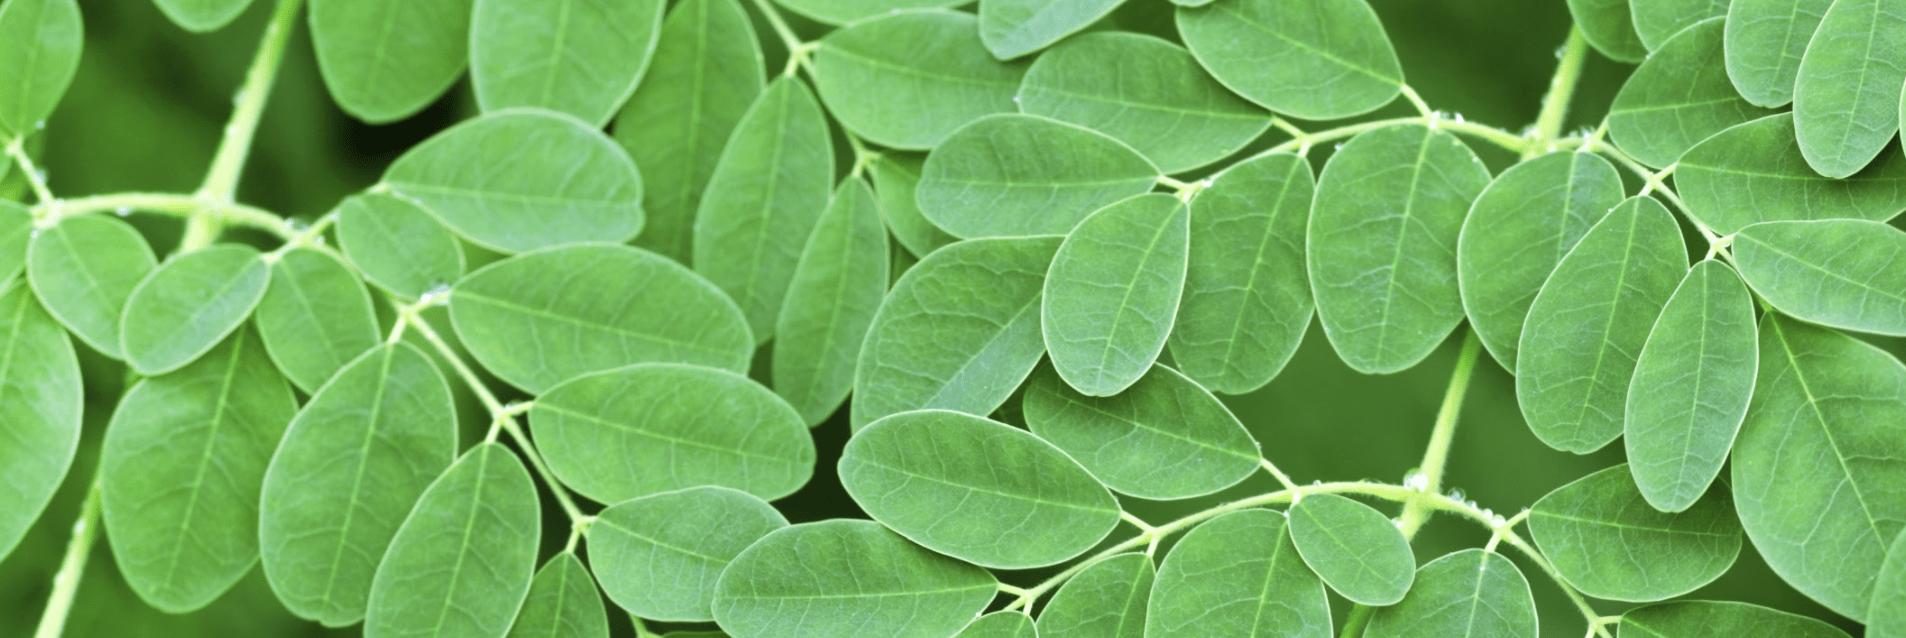 Yamba moringa closeup leaf